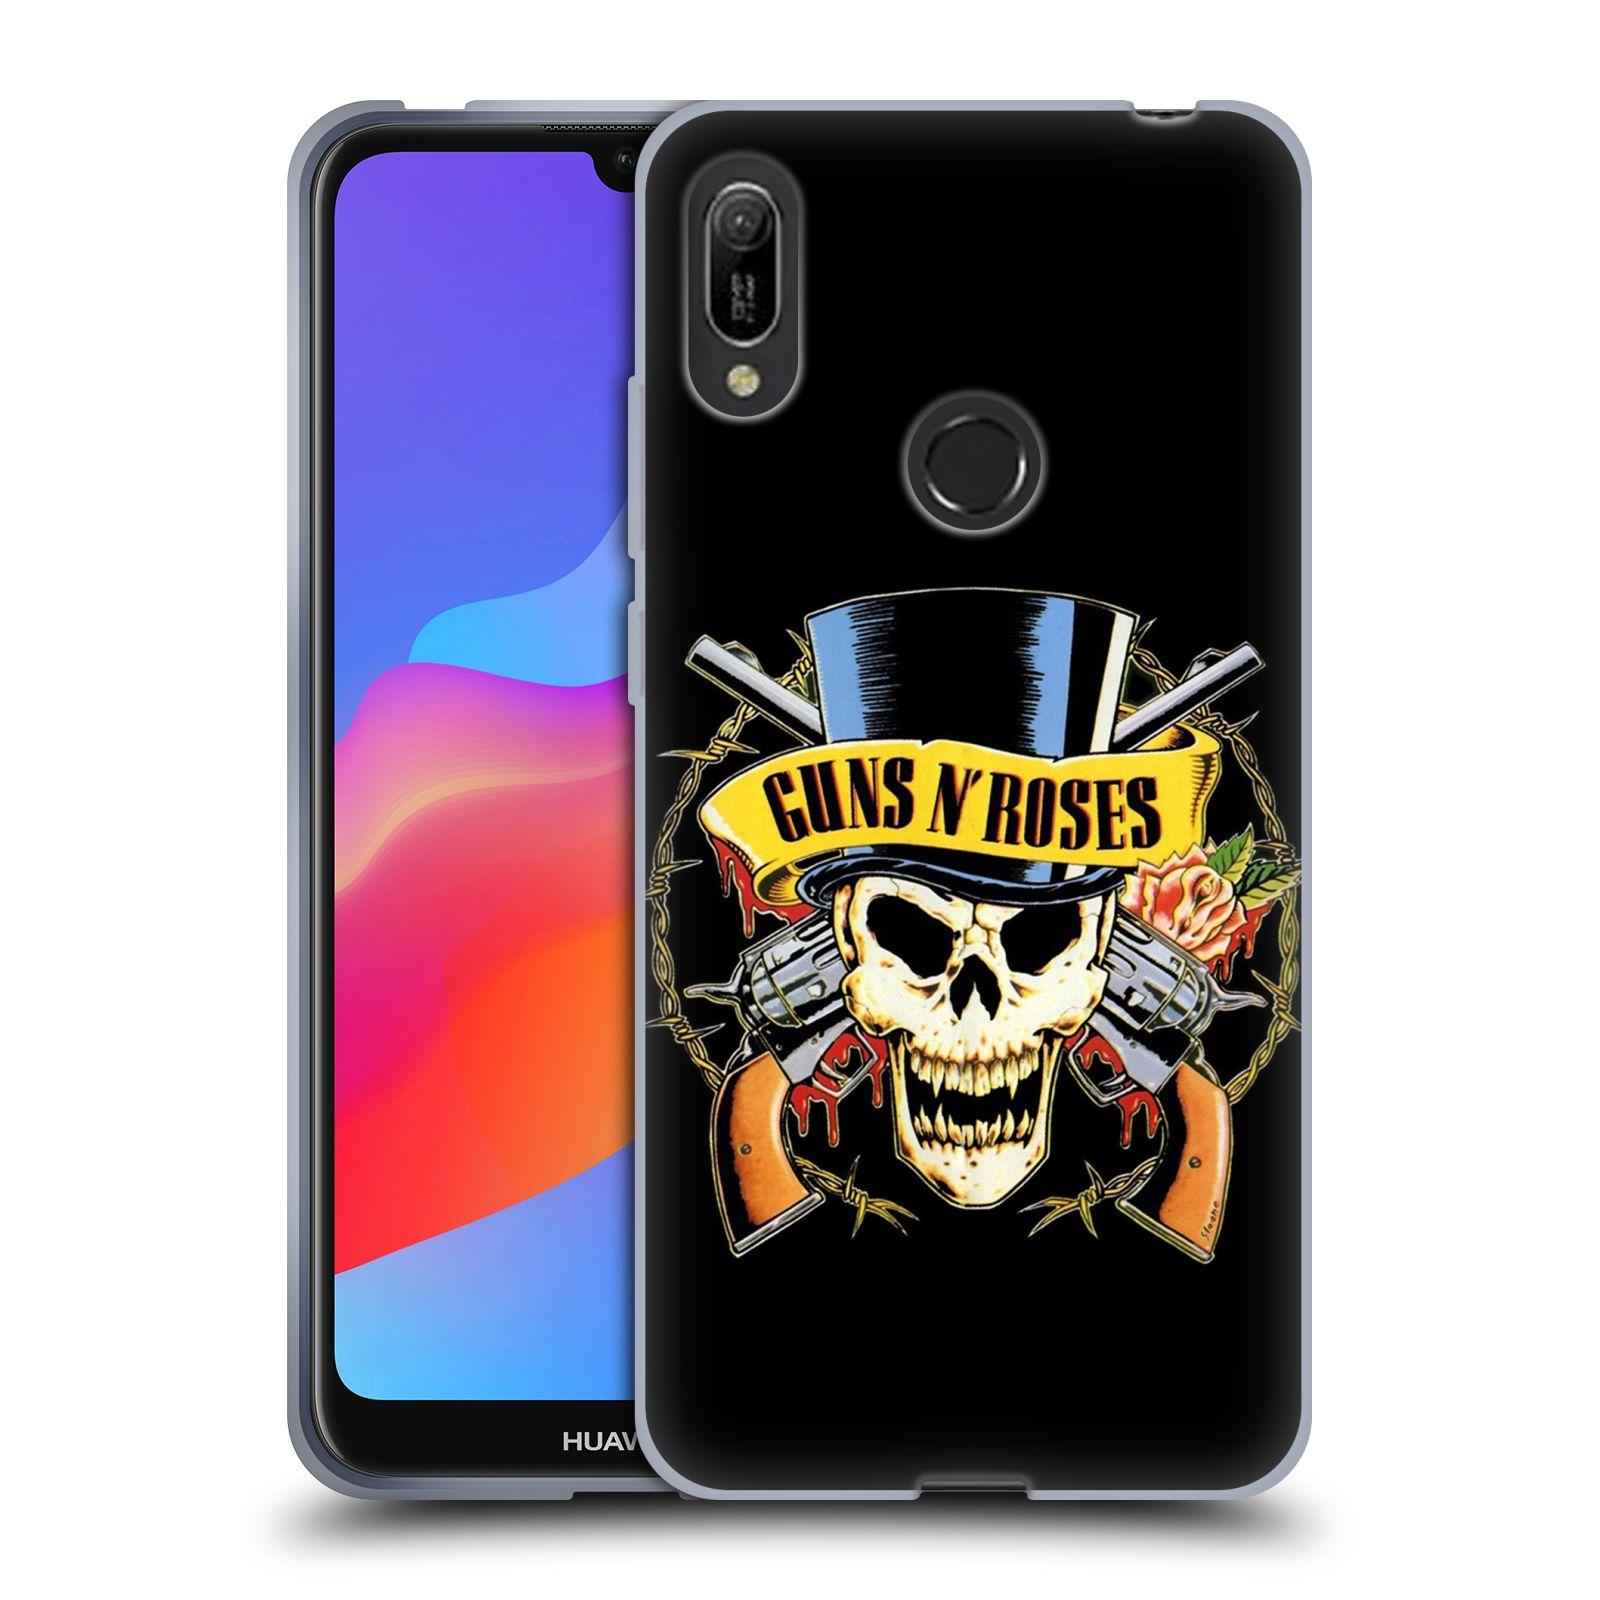 Silikonové pouzdro na mobil Huawei Y6 (2019) - Head Case - Guns N' Roses - Lebka